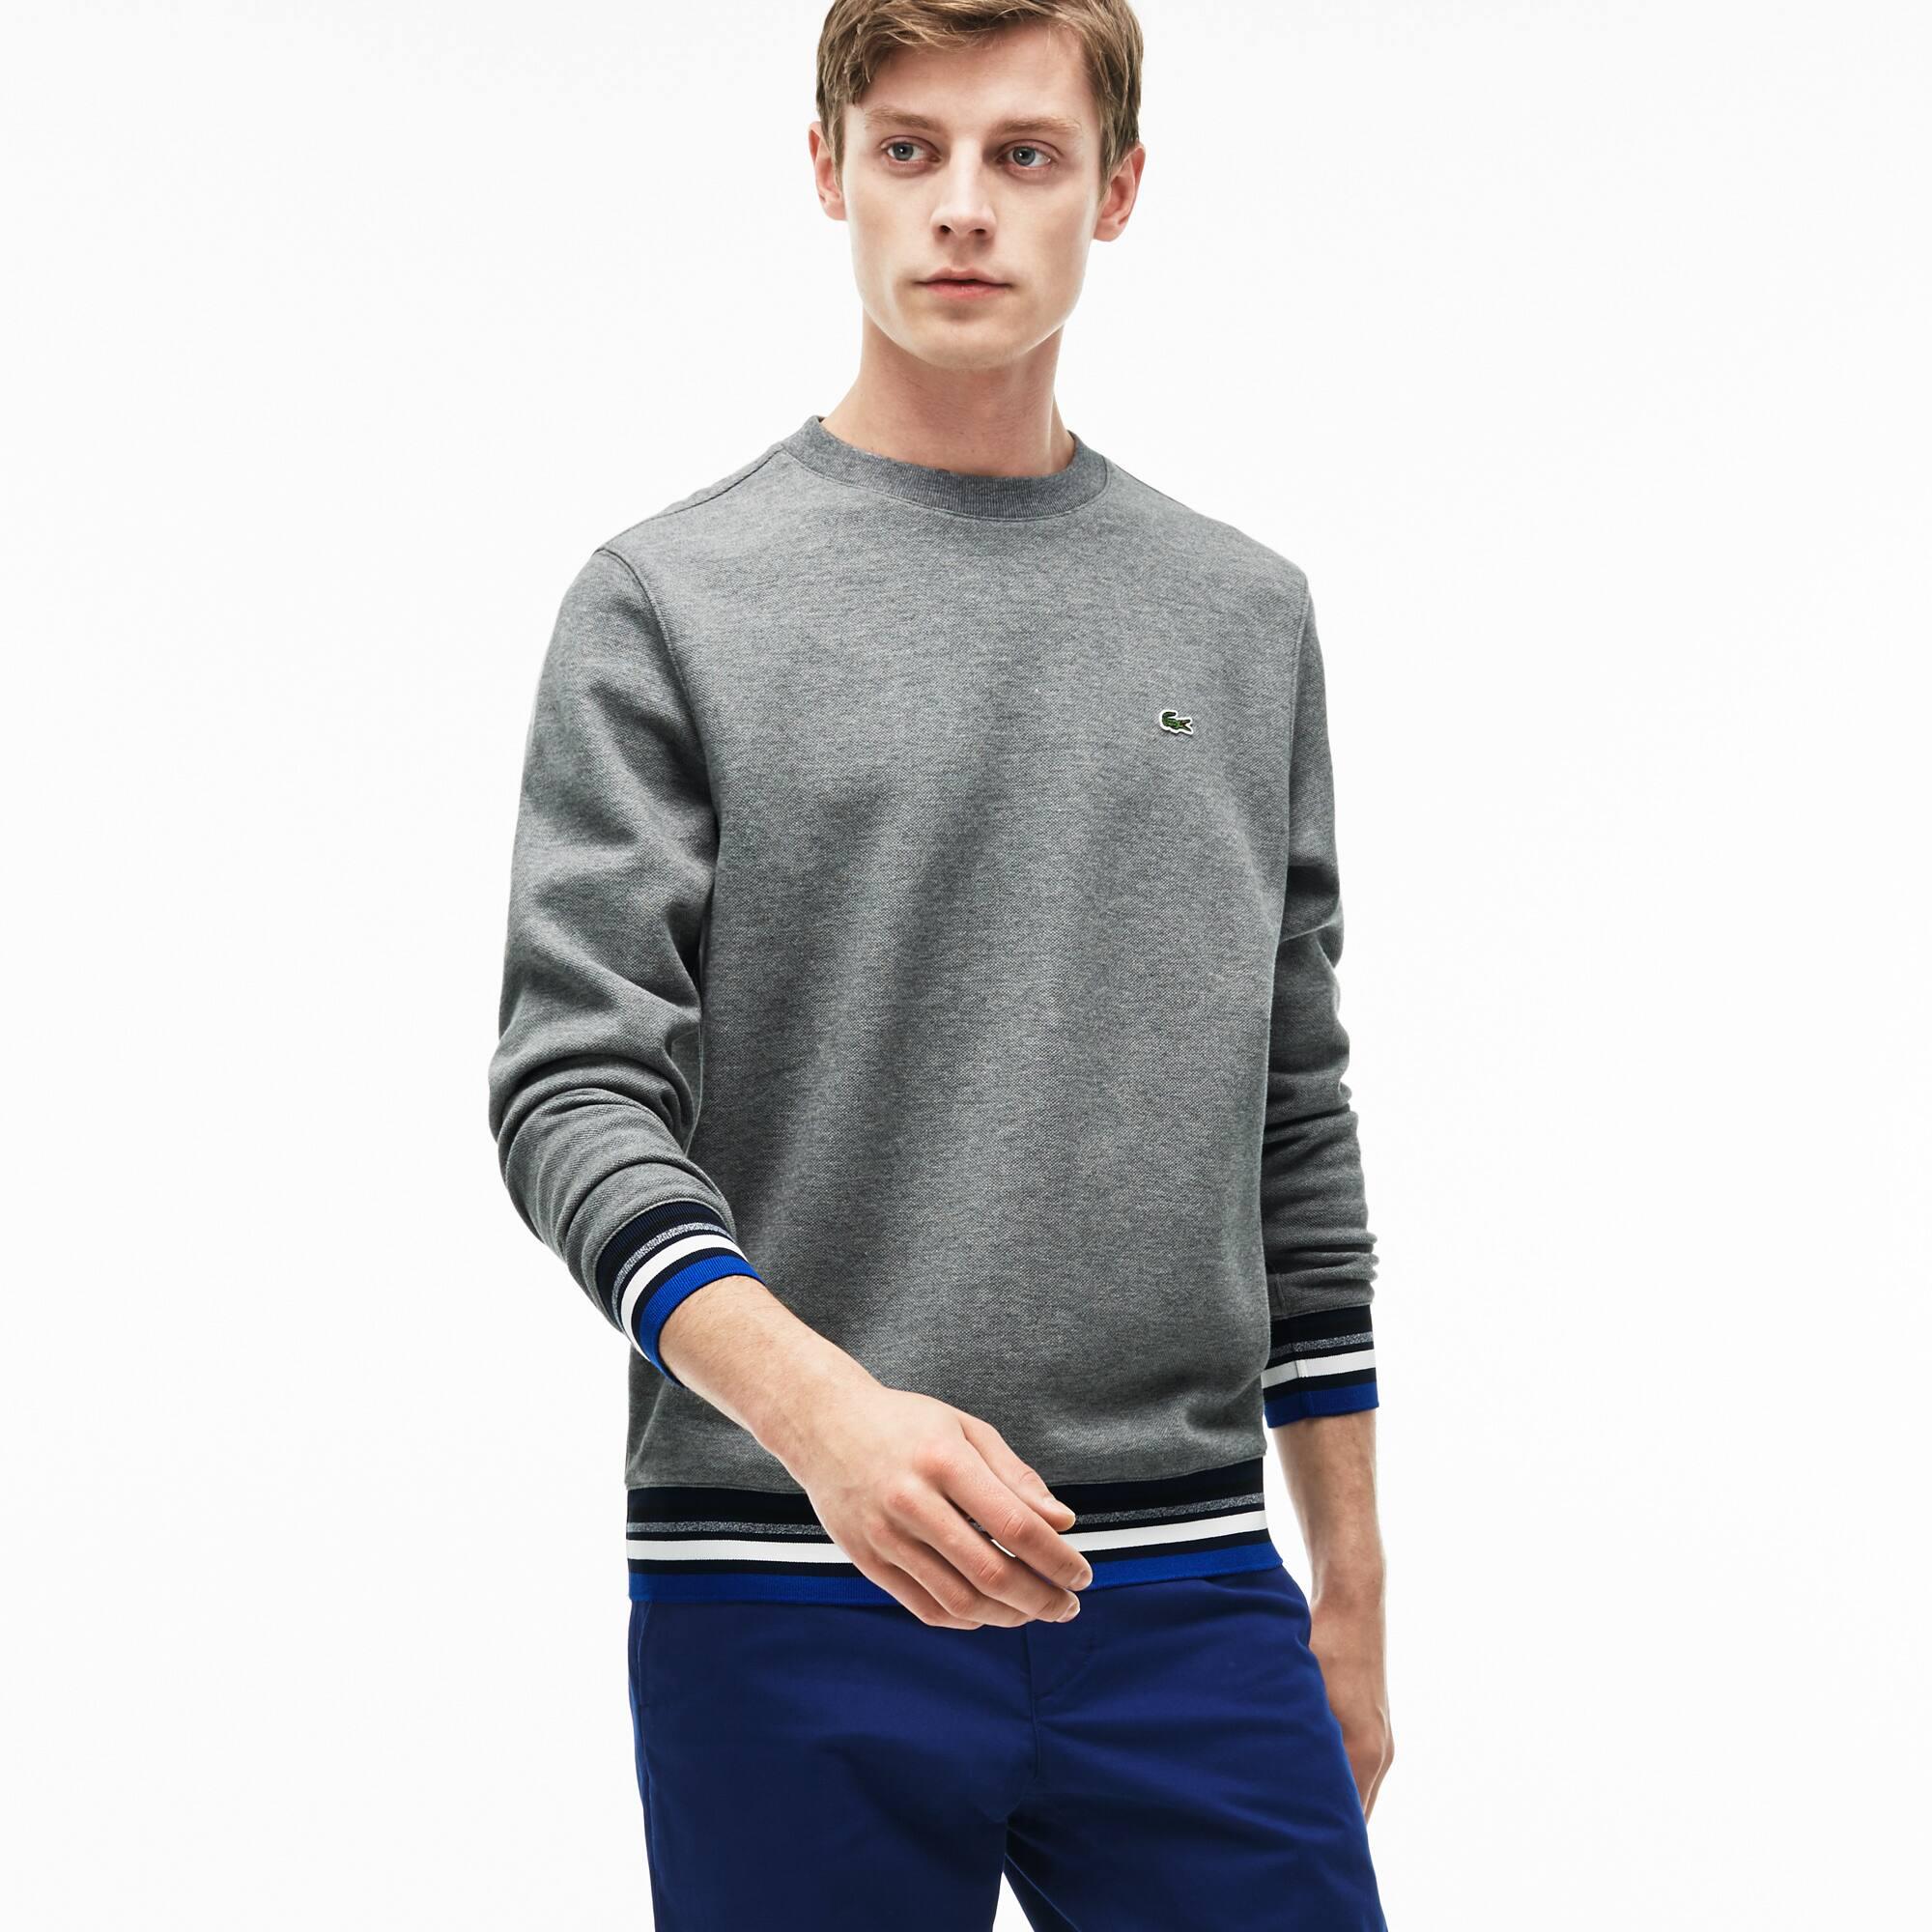 Sweatshirt en molleton avec details rayés